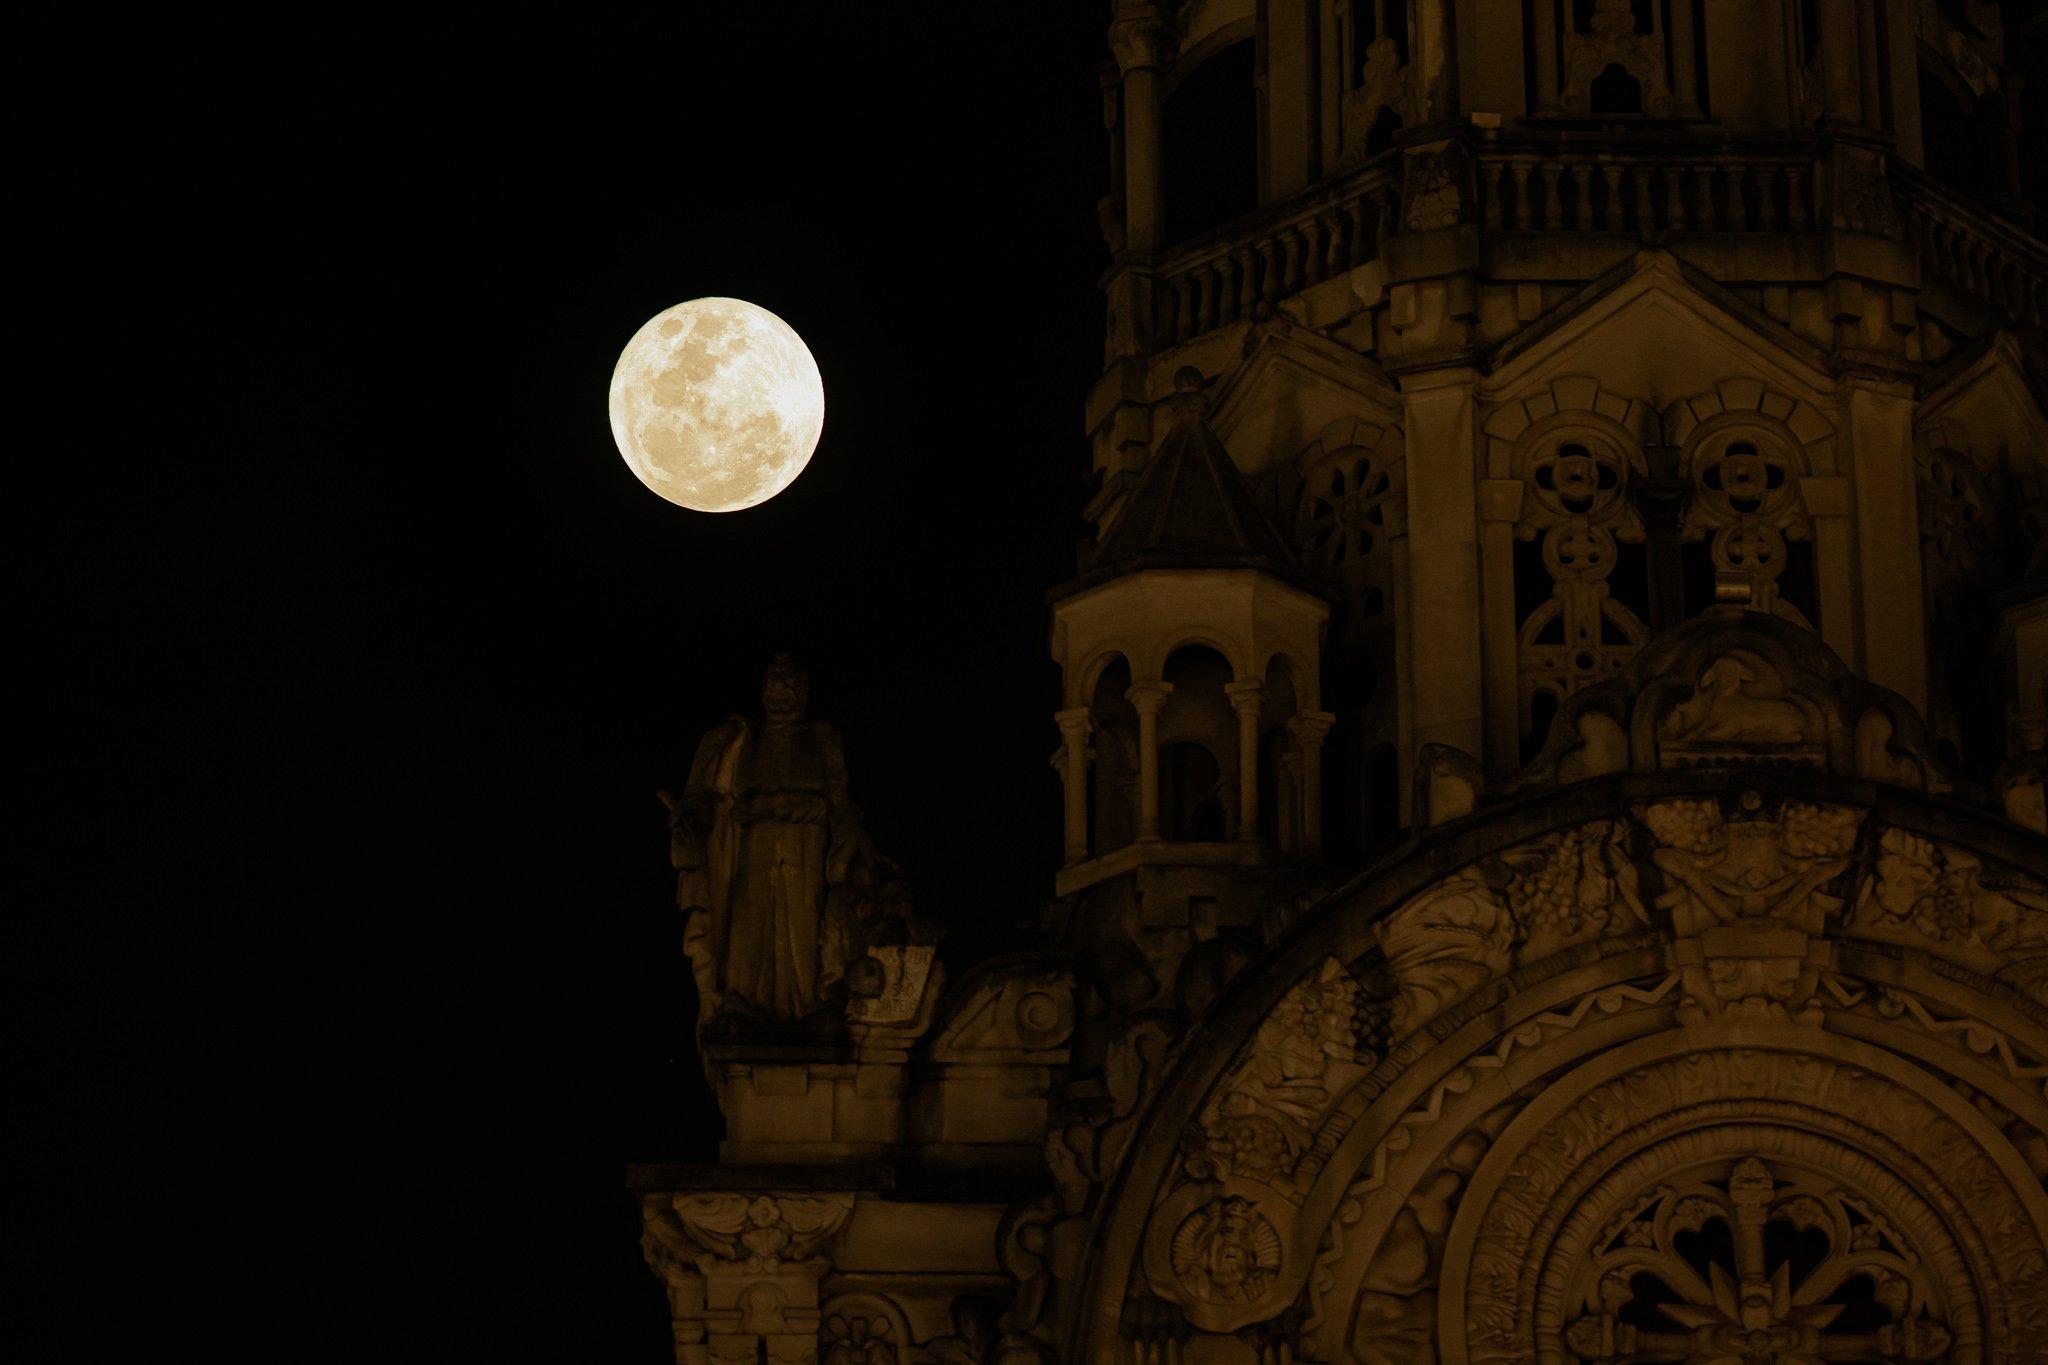 Last Super Moon 2021 Strawberry Moon Over Brazil's Sky